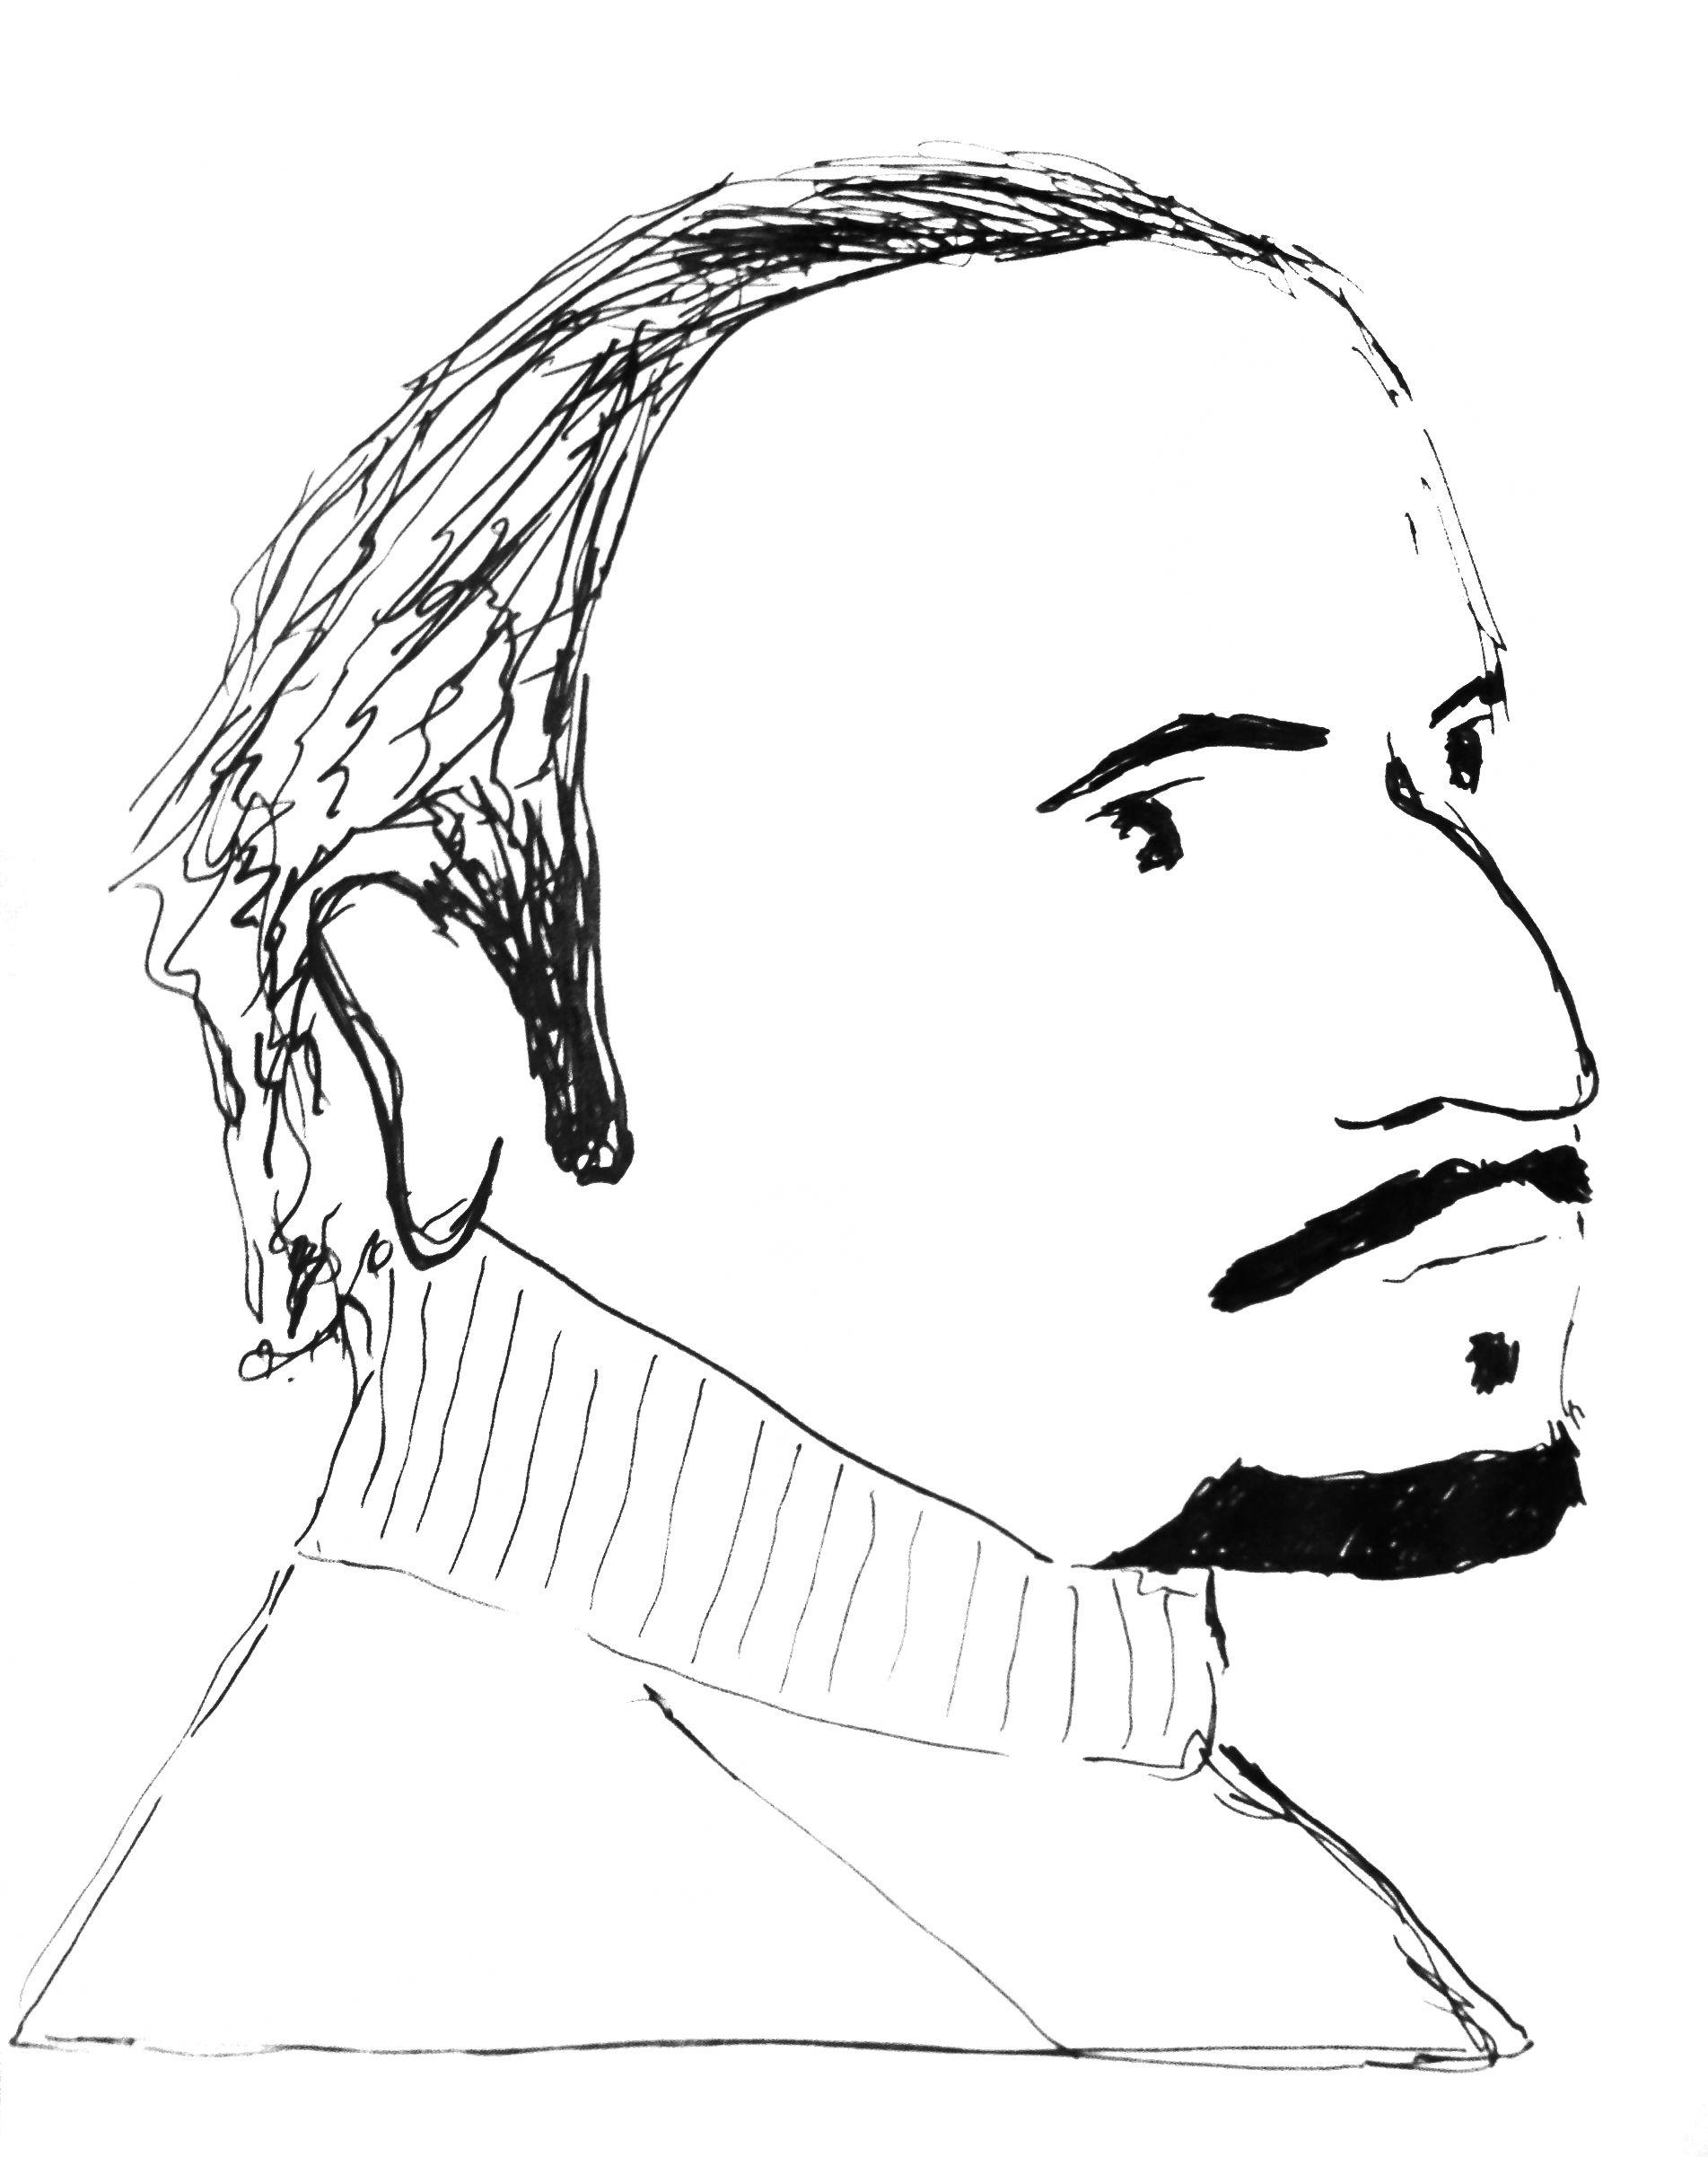 colson whitehead studied magic realism